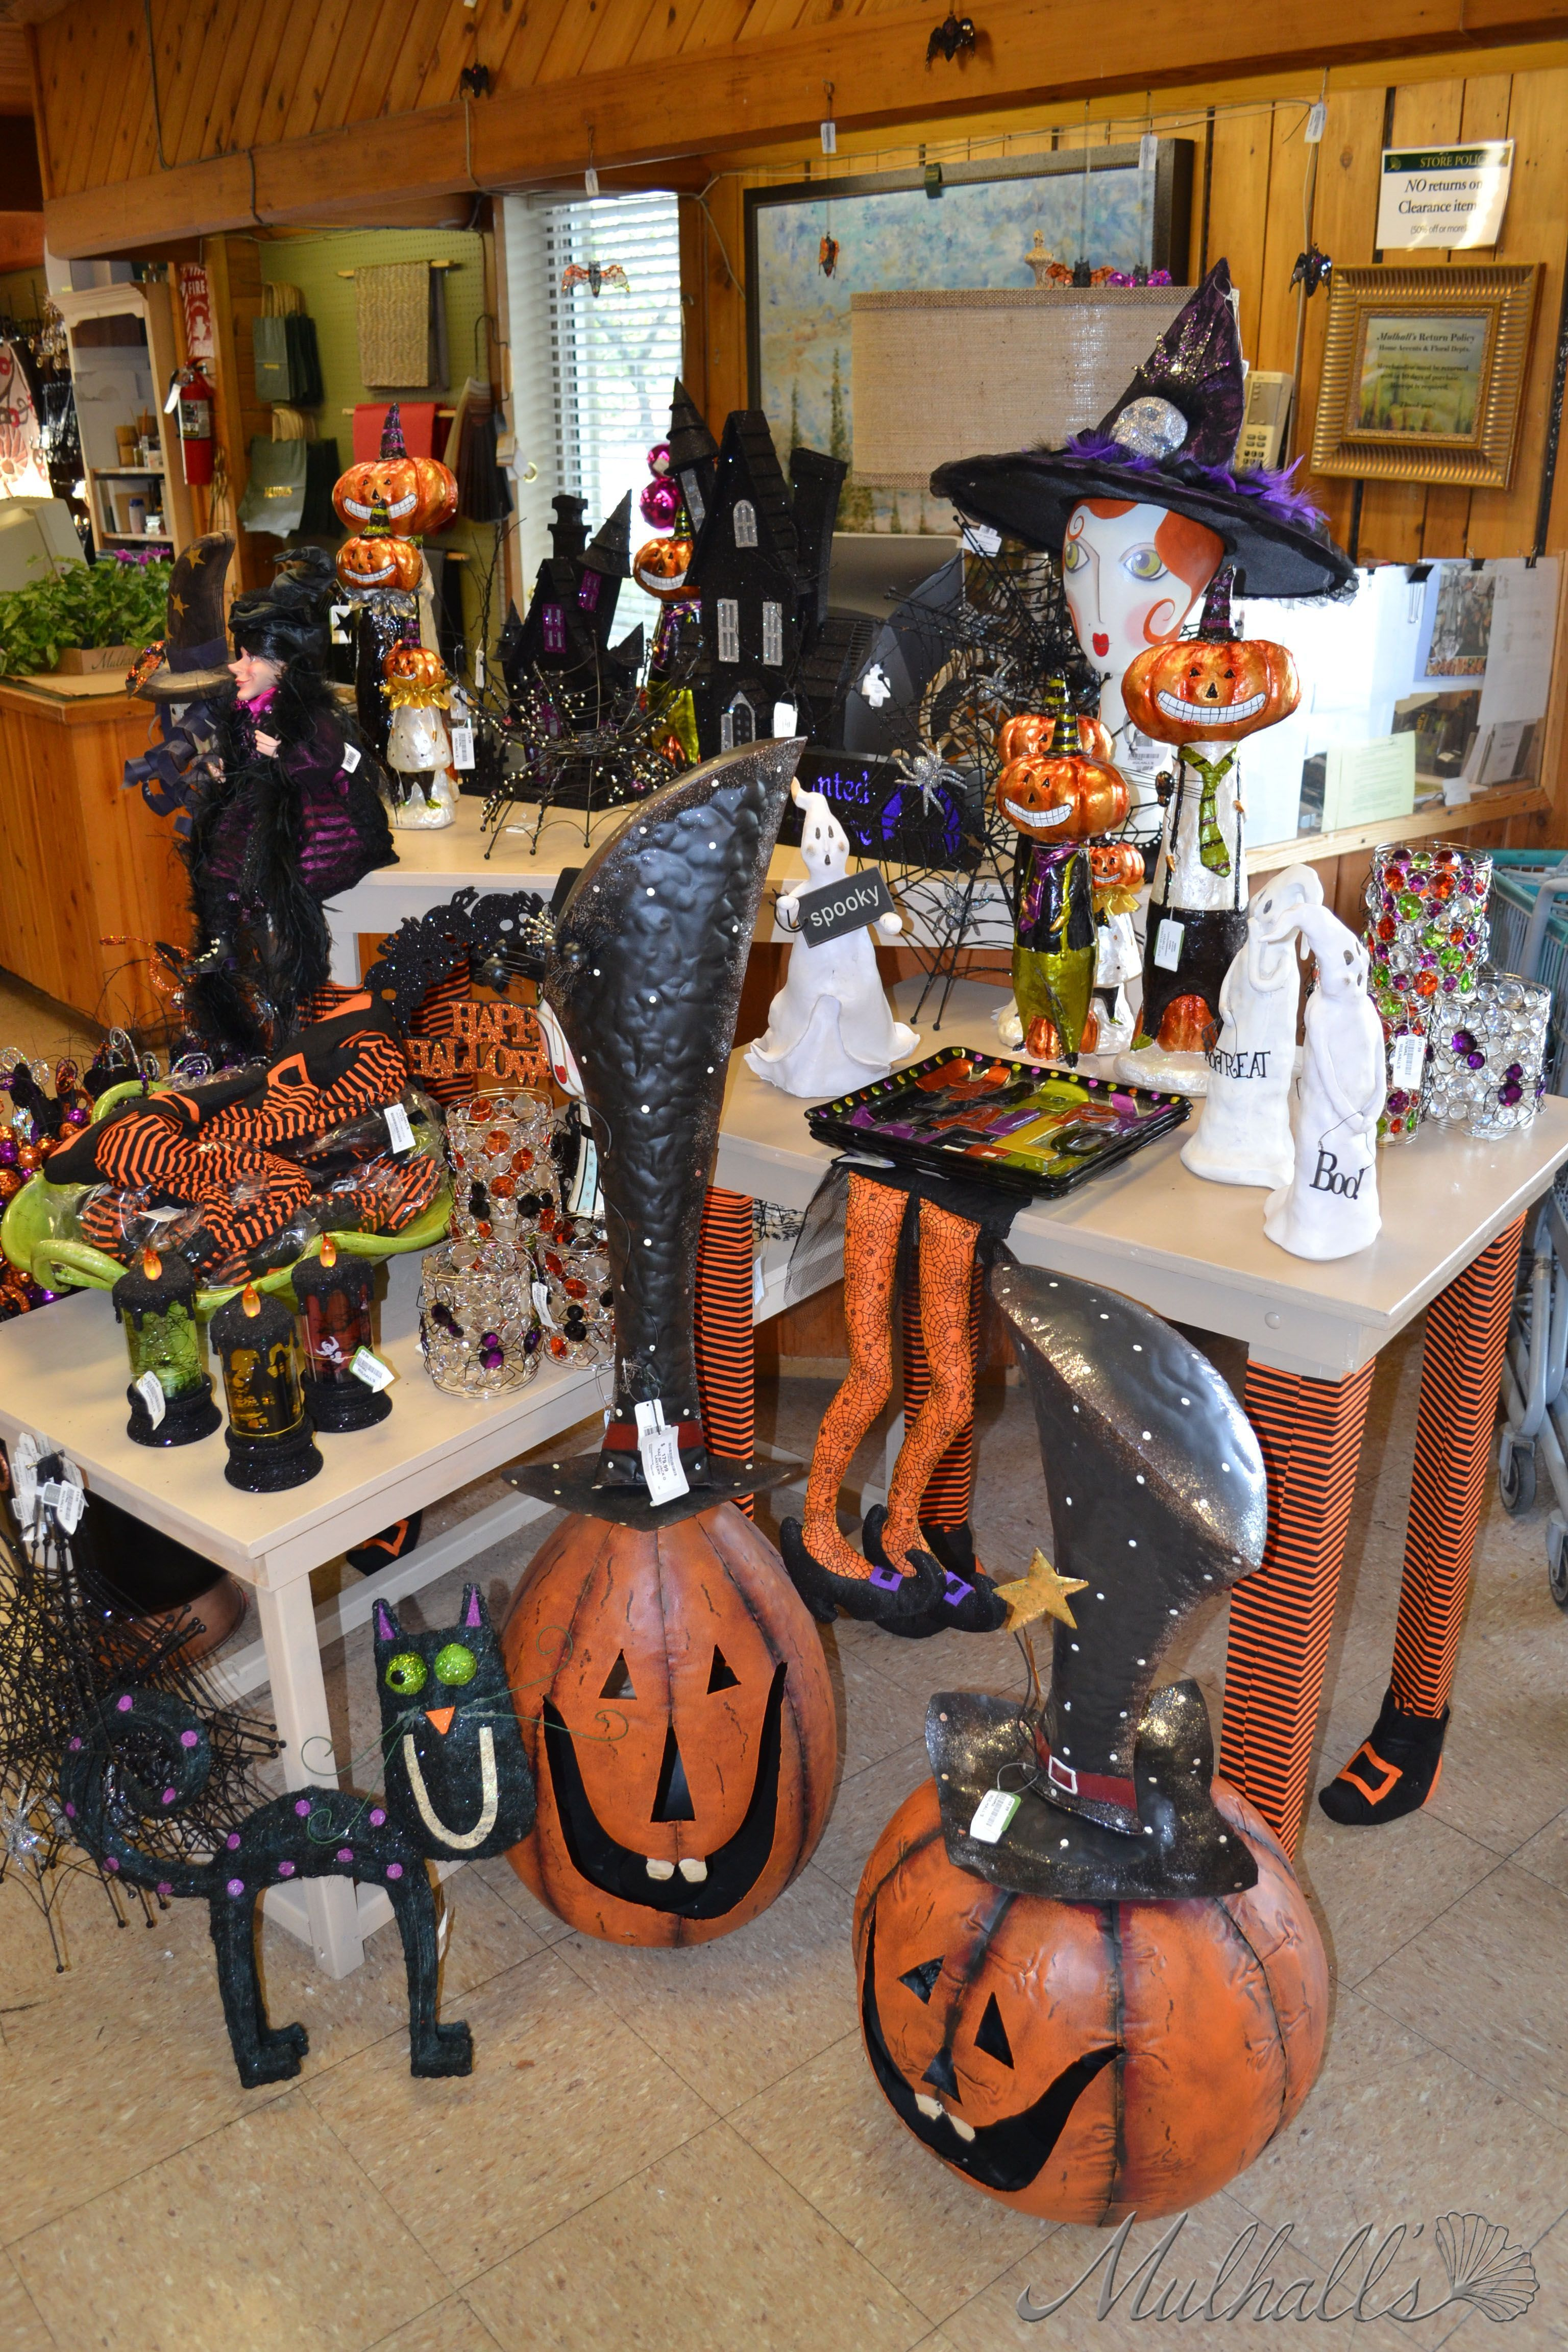 Halloween display in 2020 Halloween displays, Halloween